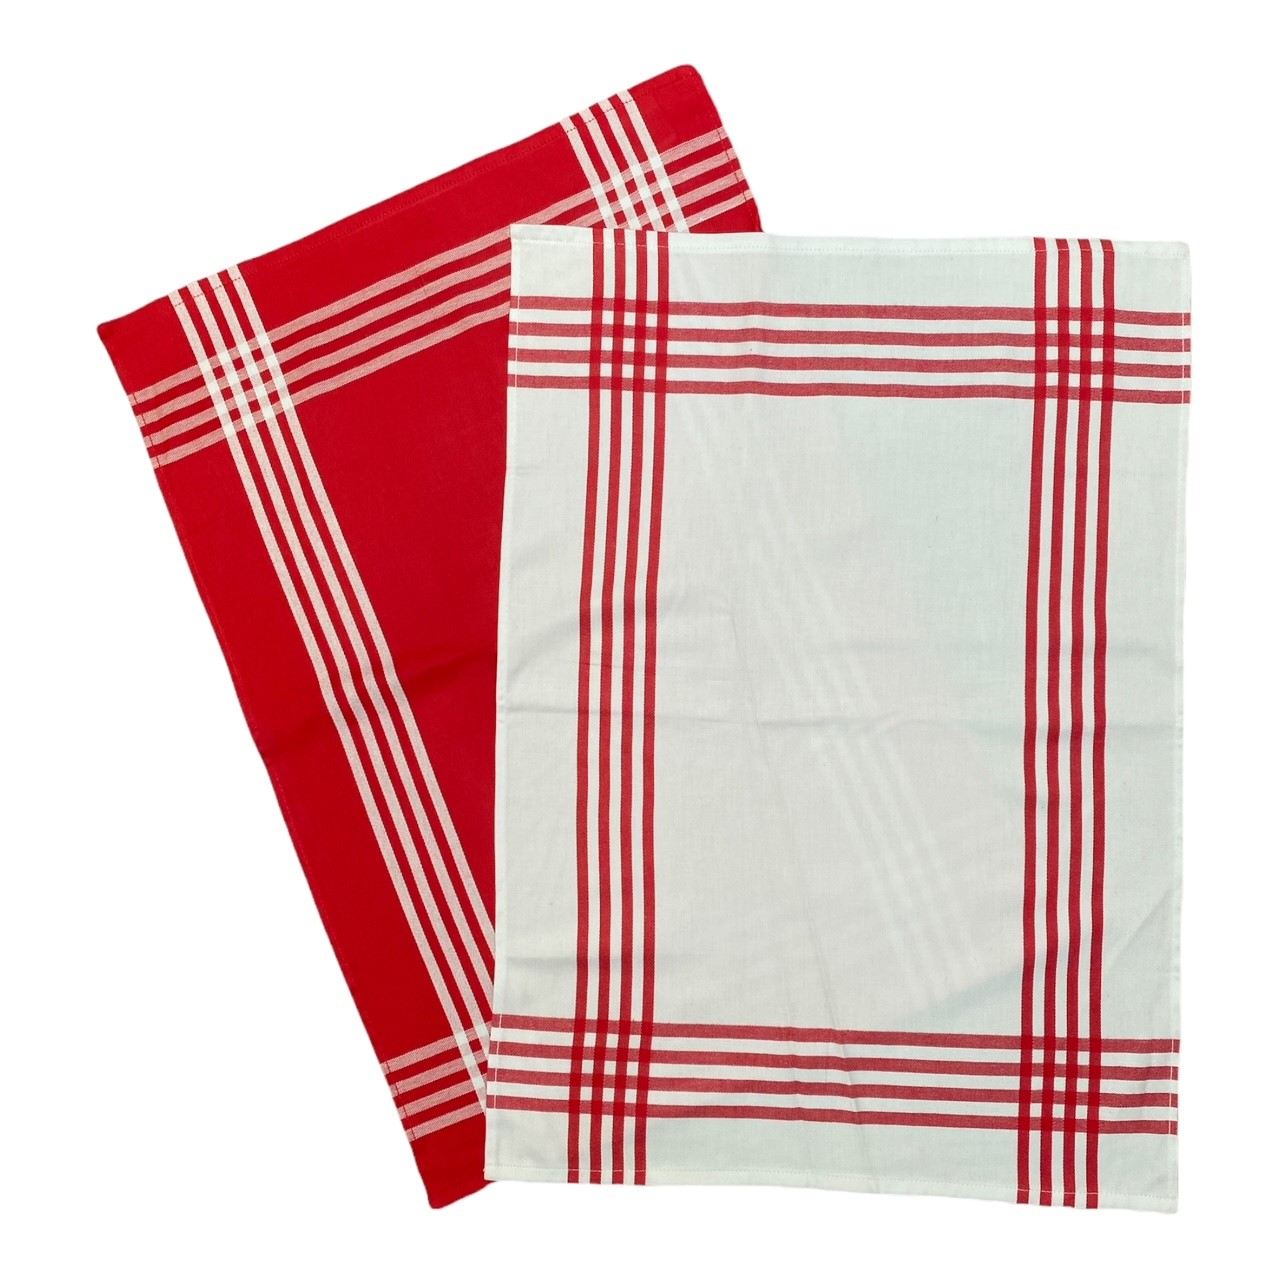 Duo torchons assortis bicolores rayés rouges 50 x 70